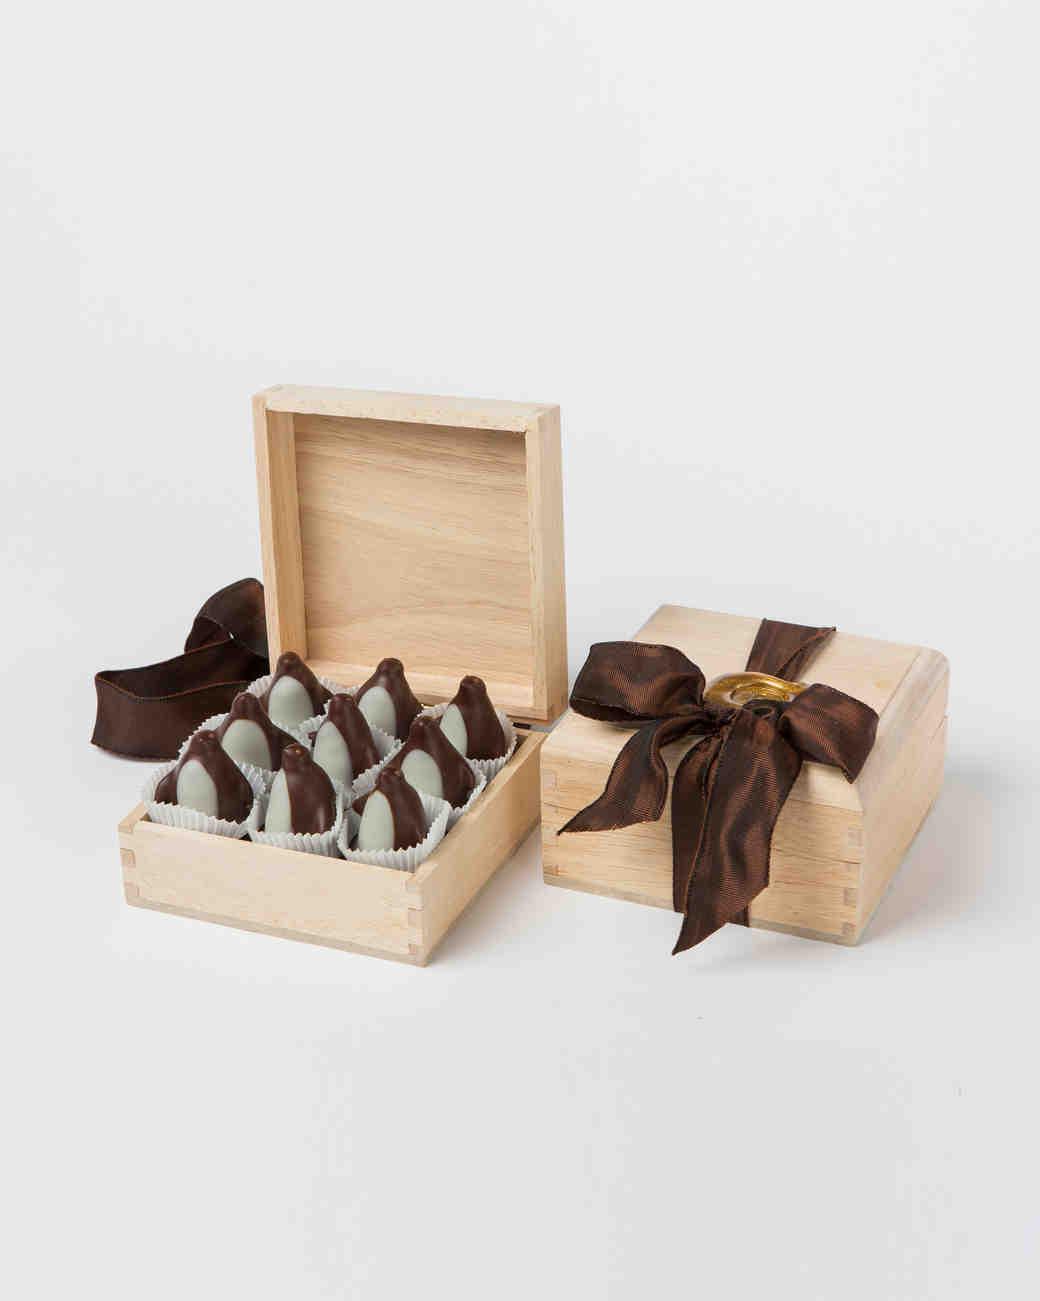 holiday-gift-guide-ring-bearer-chocolates-1215.jpg